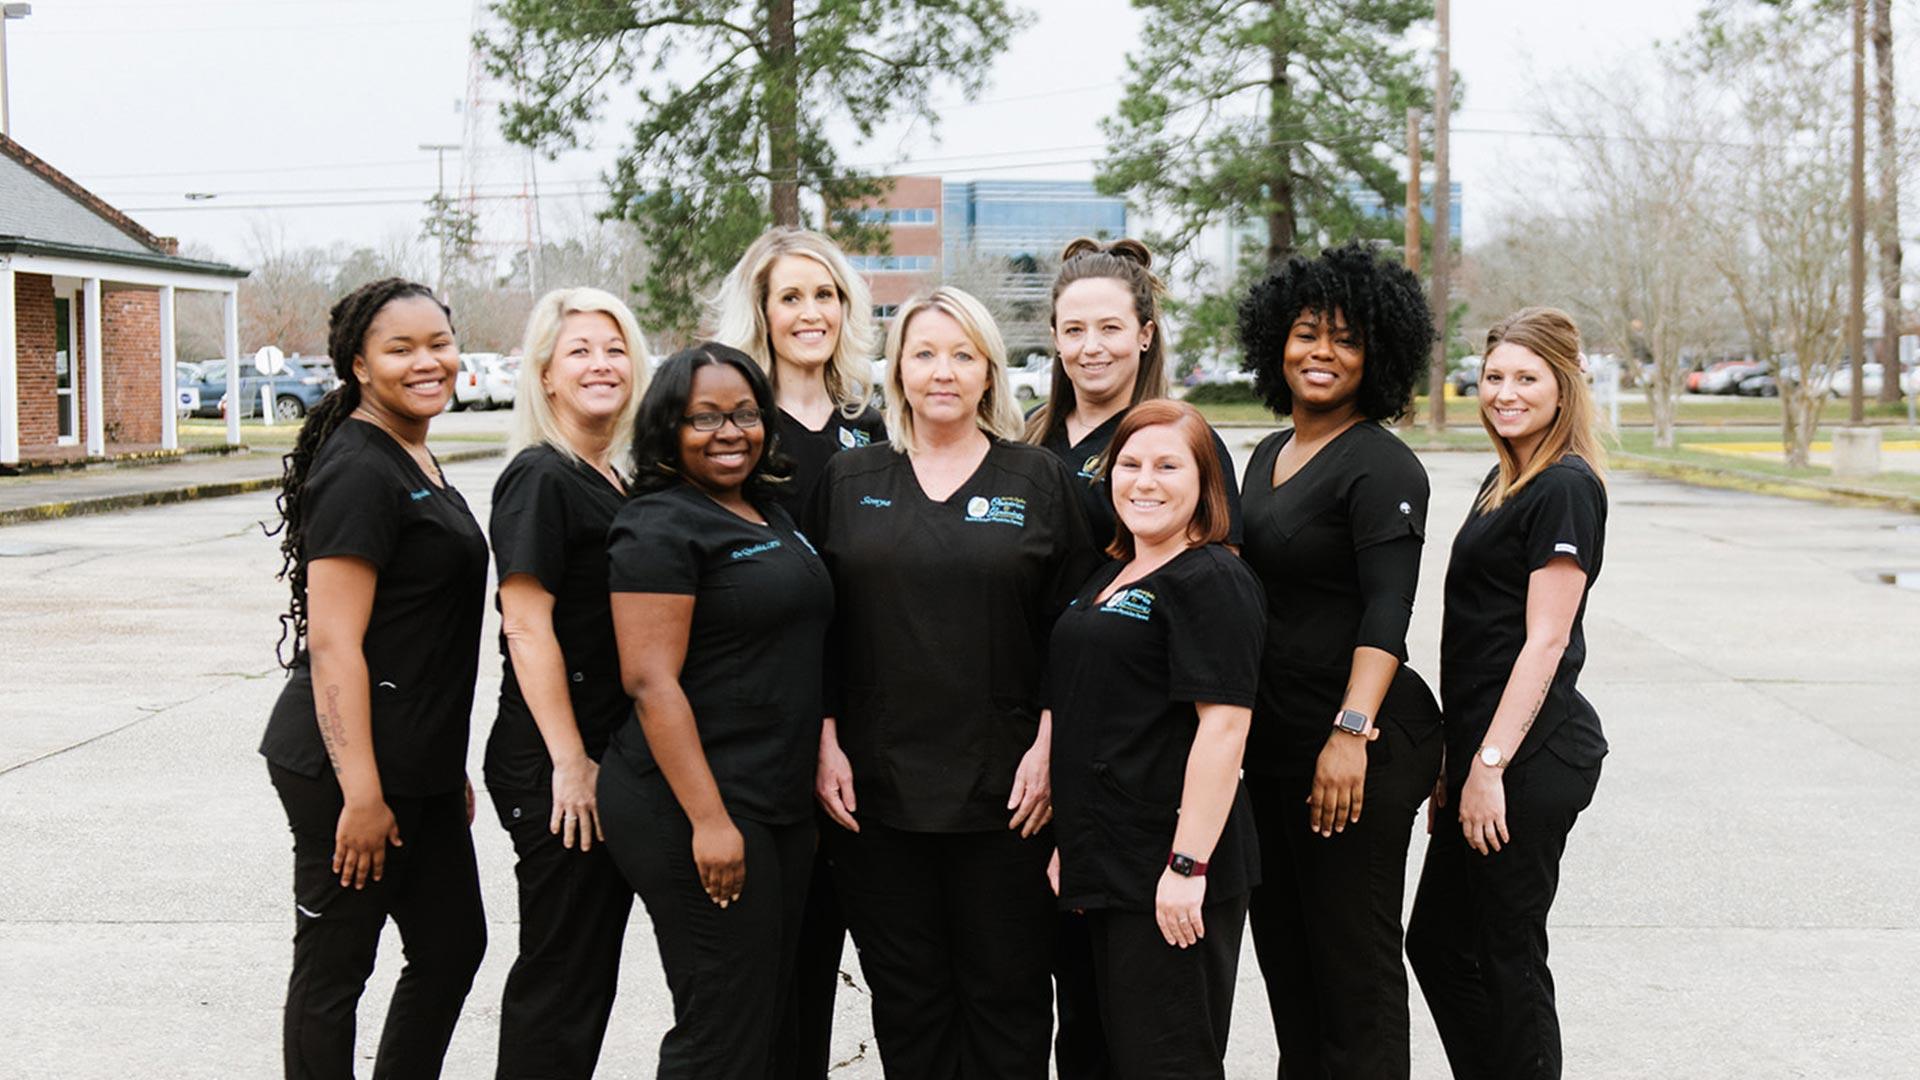 The team of nurses at North Oaks OBGYN.